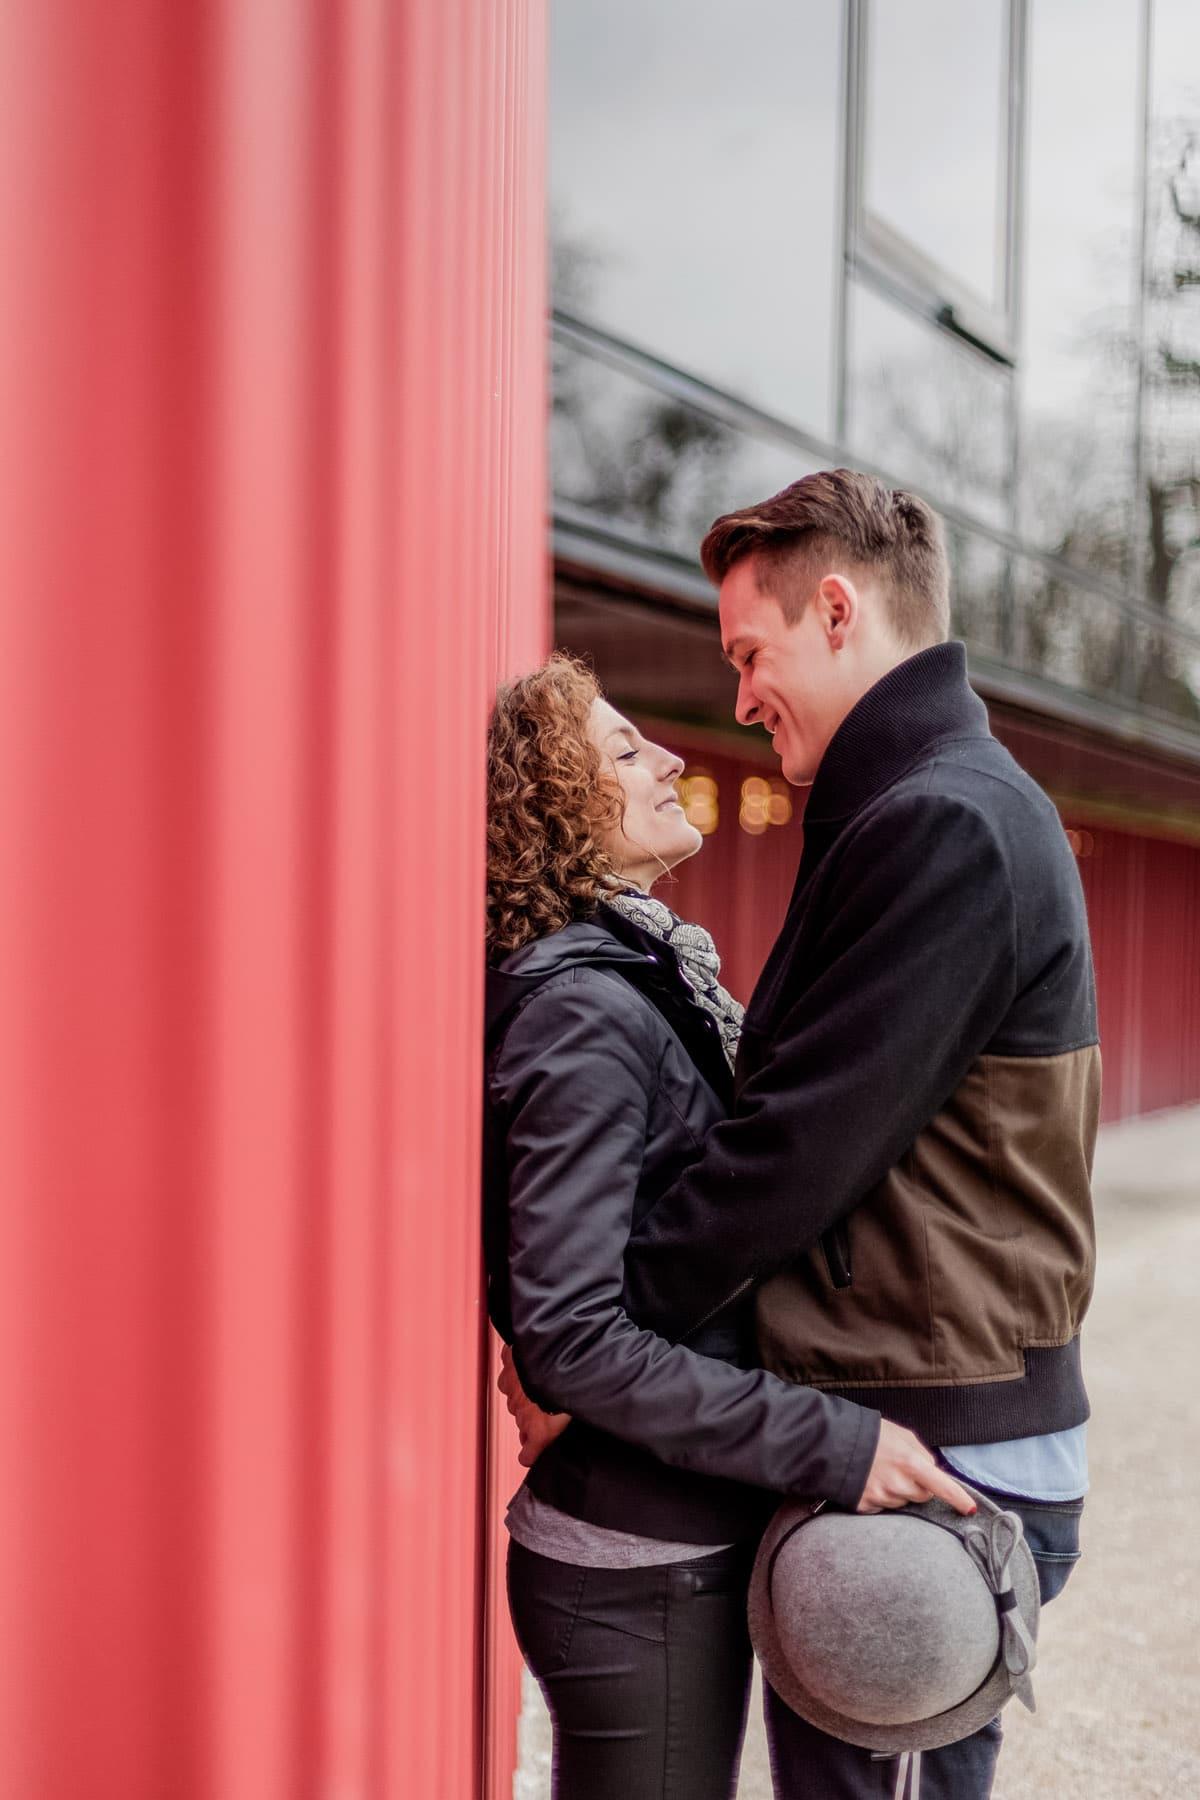 photographe st valentin couple love session engagement bordeaux seance photo lifestyle fineart francais sarah miramon liona azbe 08